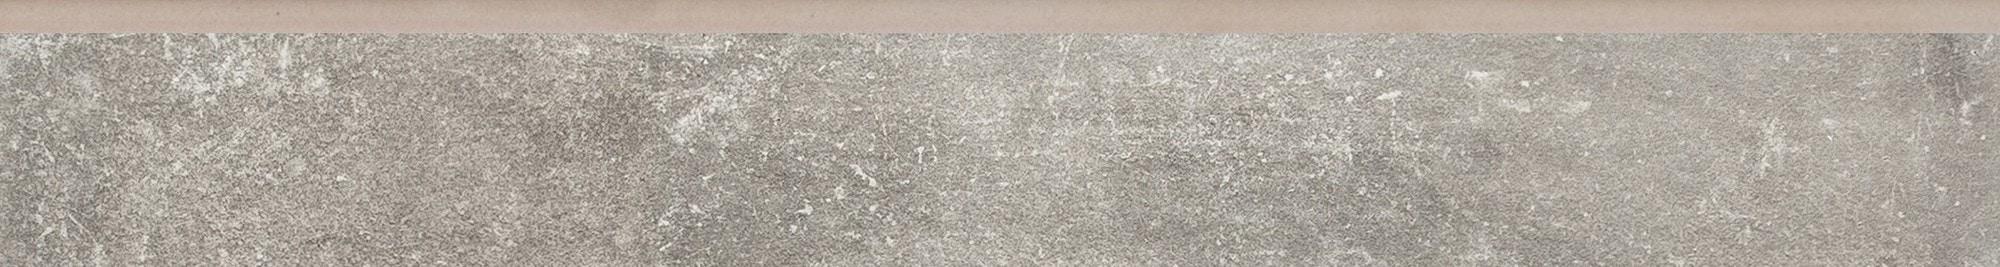 Cokół Cerrad Montego Dust 797x80x9mm 30116